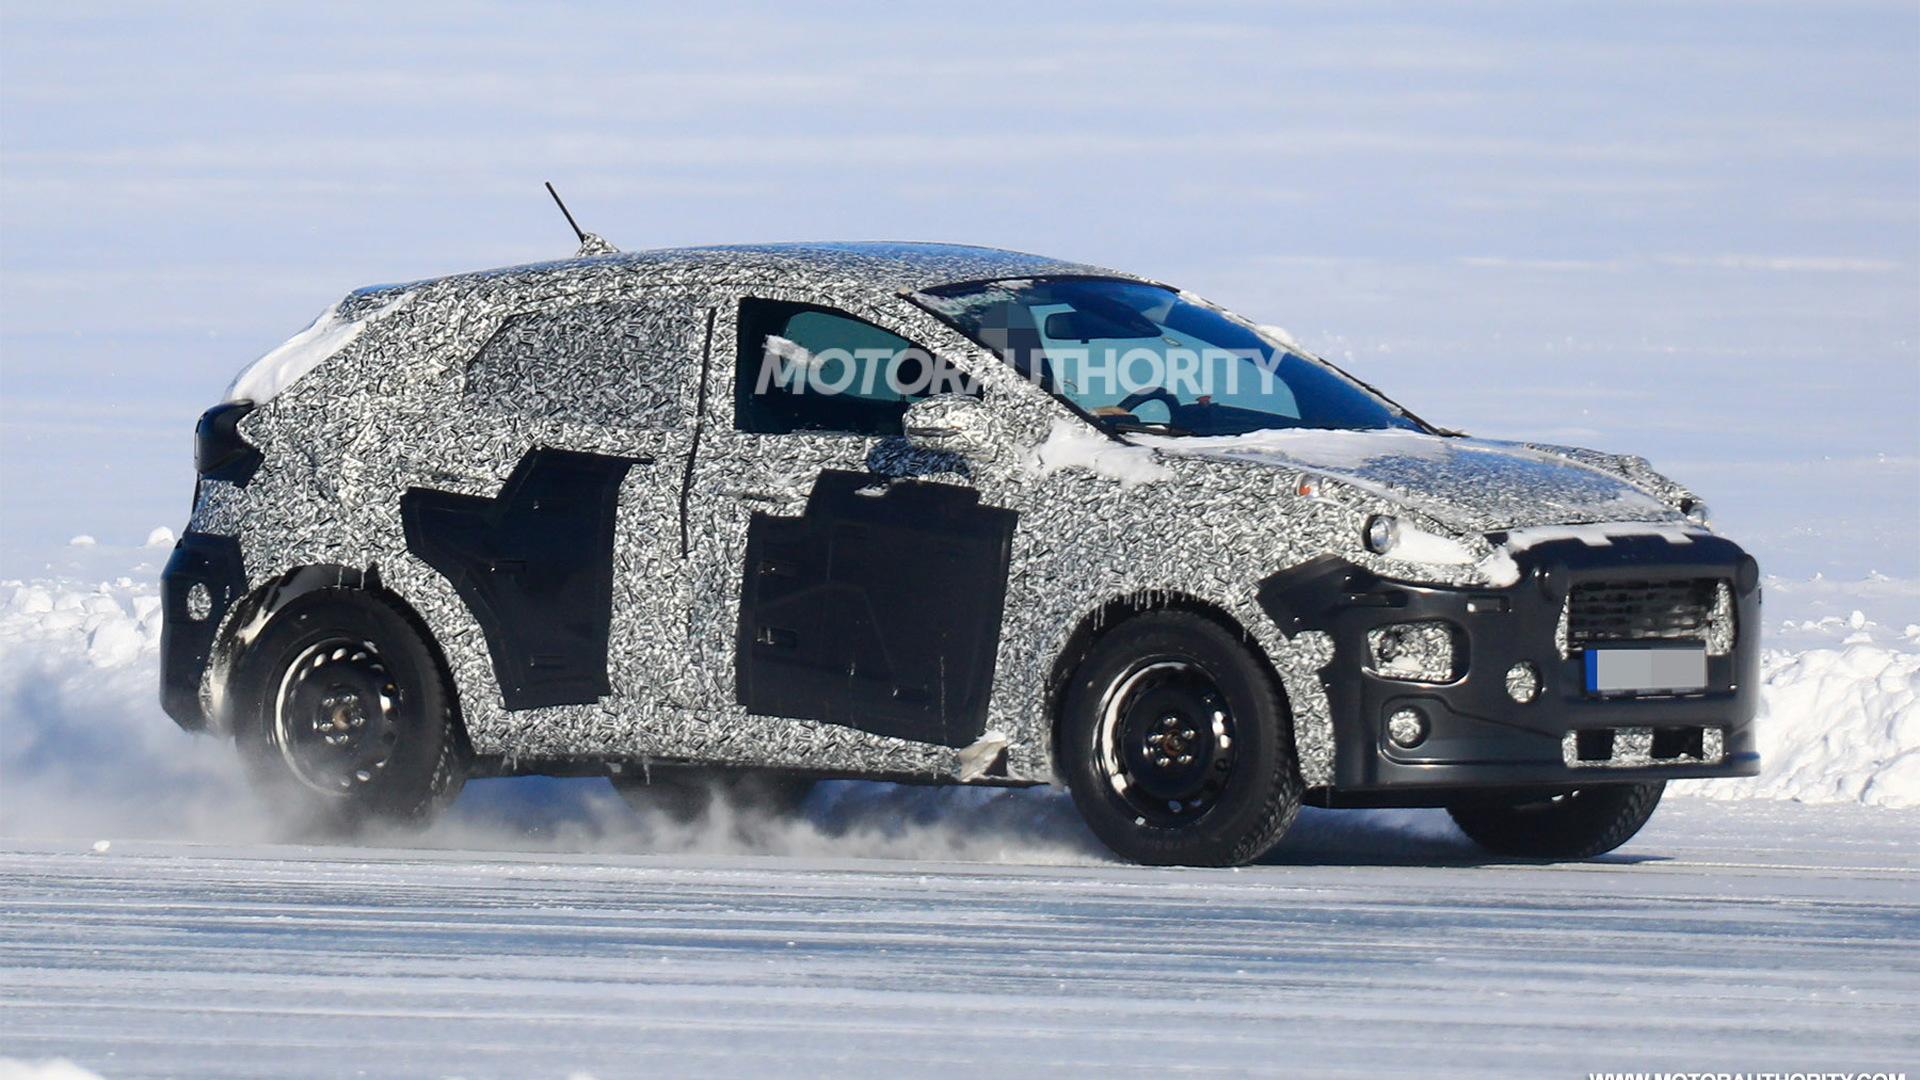 2021 Ford Puma spy shots - Image via S. Baldauf/SB-Medien